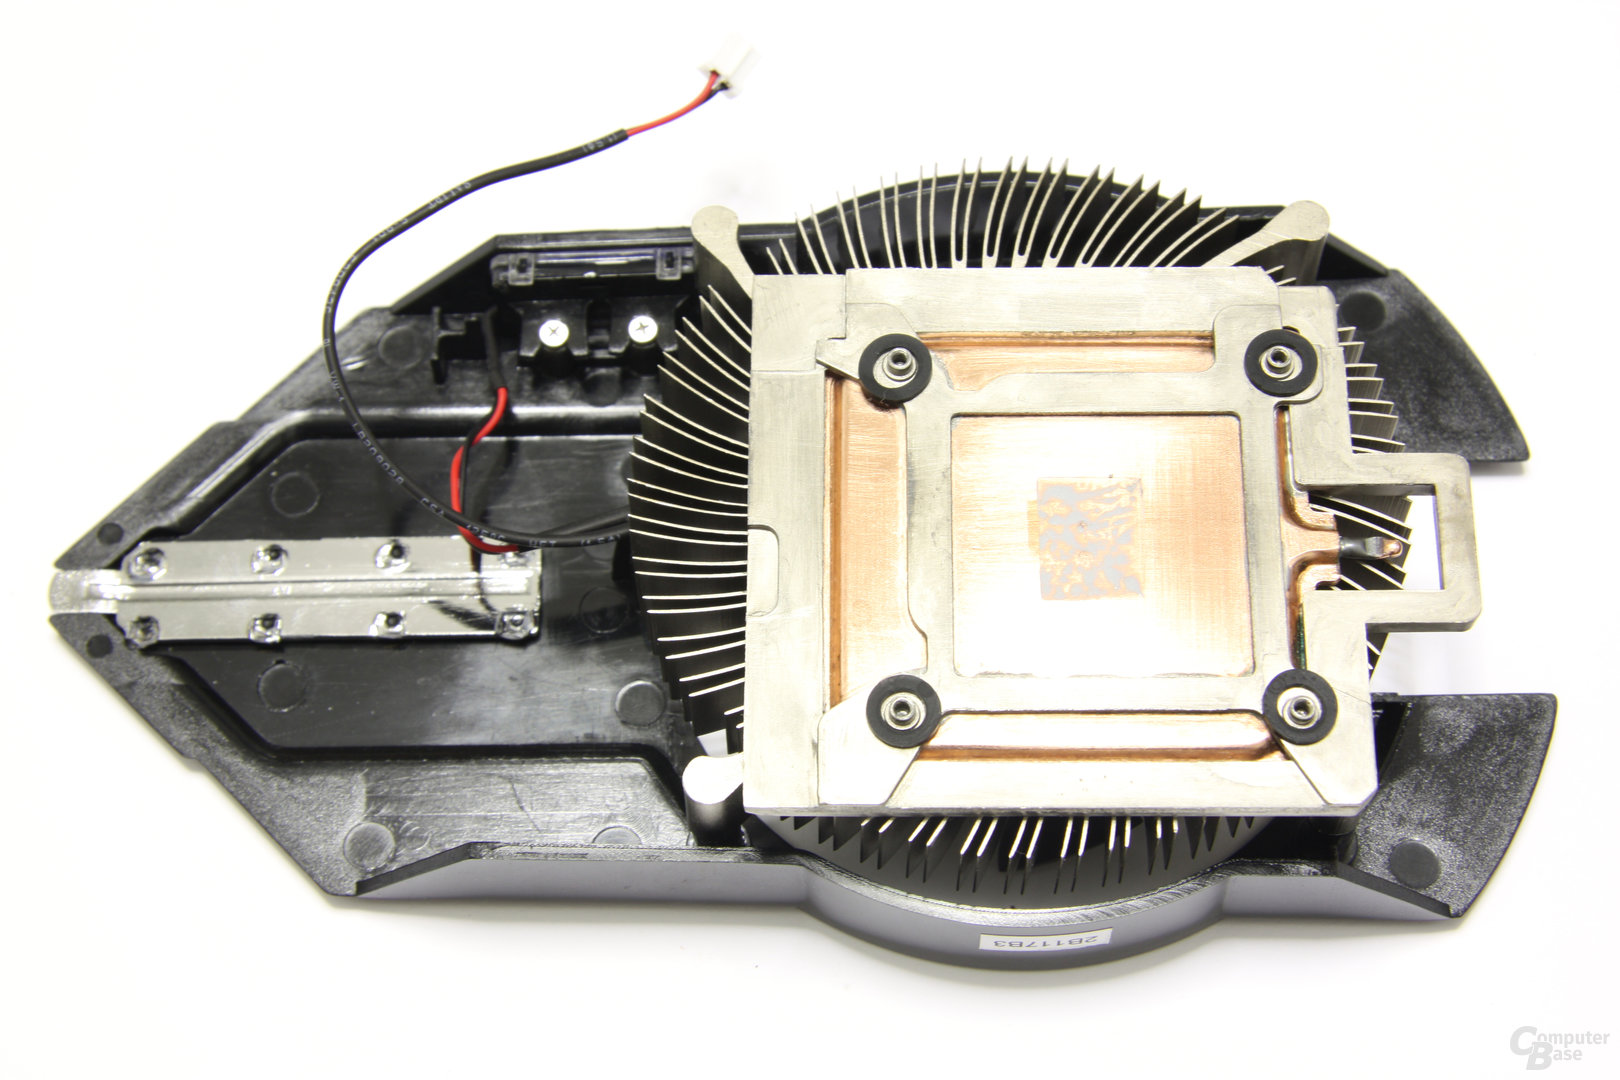 Radeon HD 6750 Vapor-X Kühlerrückseite